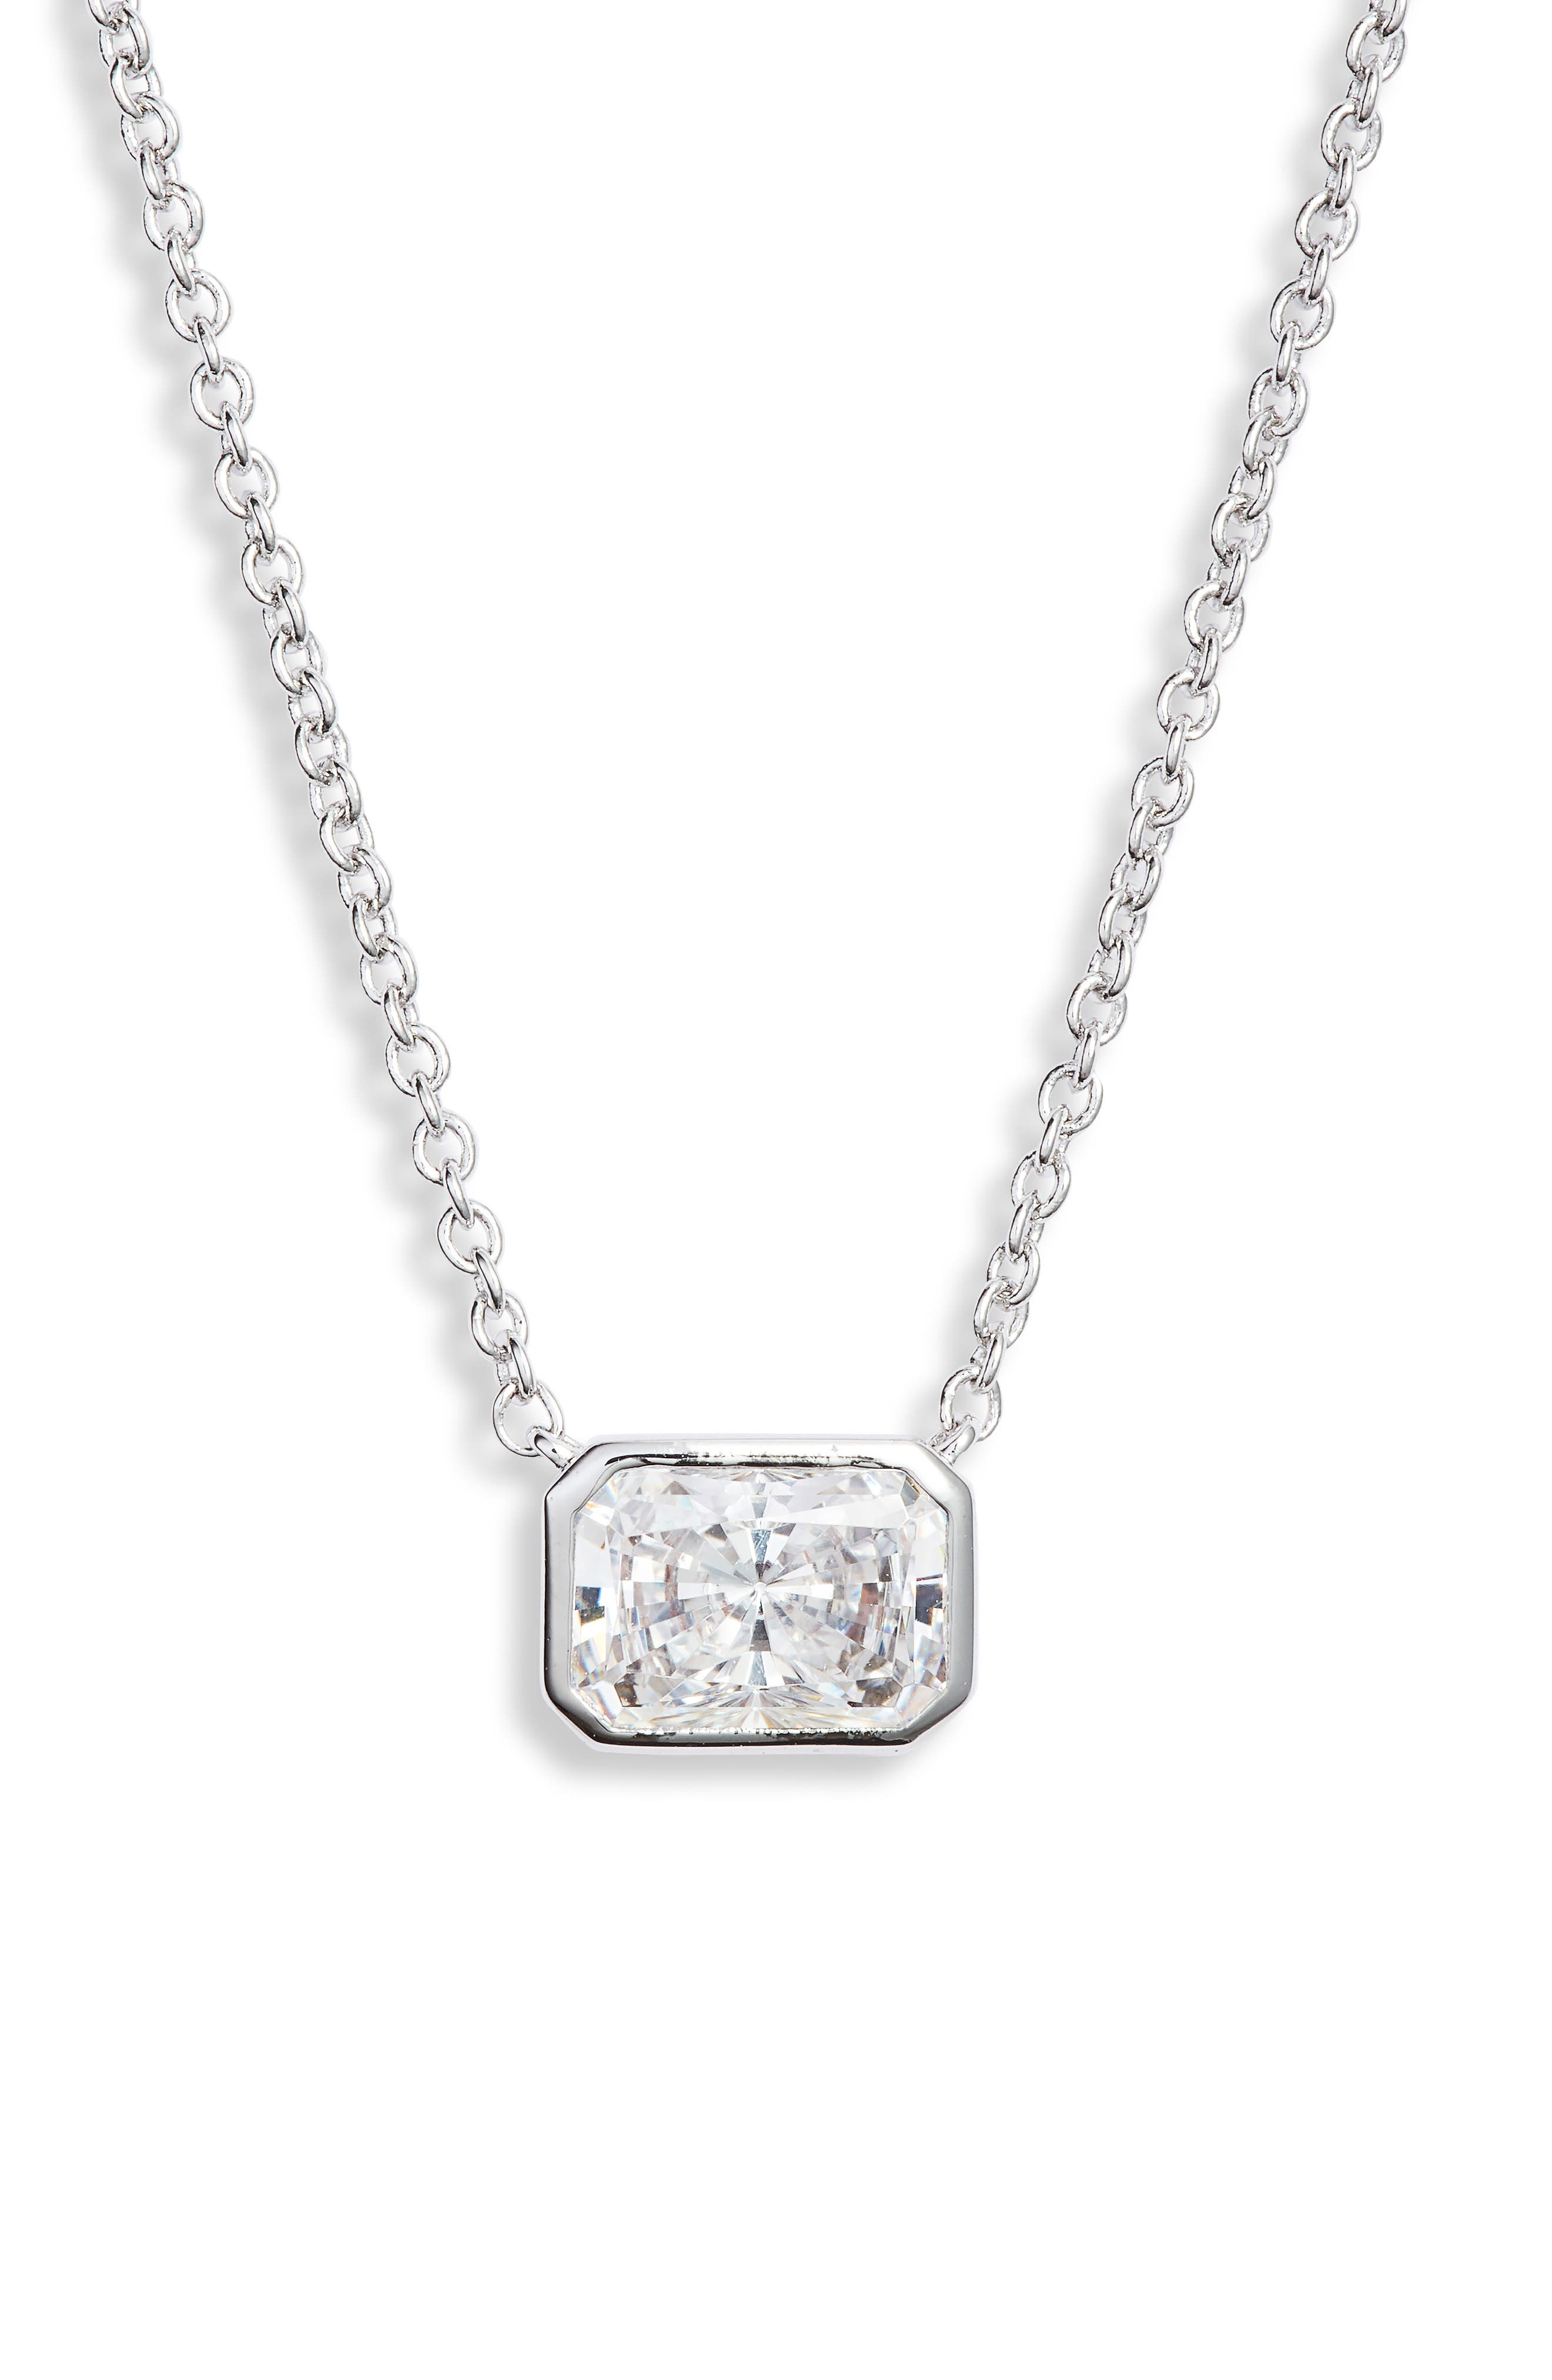 NADRI Baguette Pendant Necklace in White